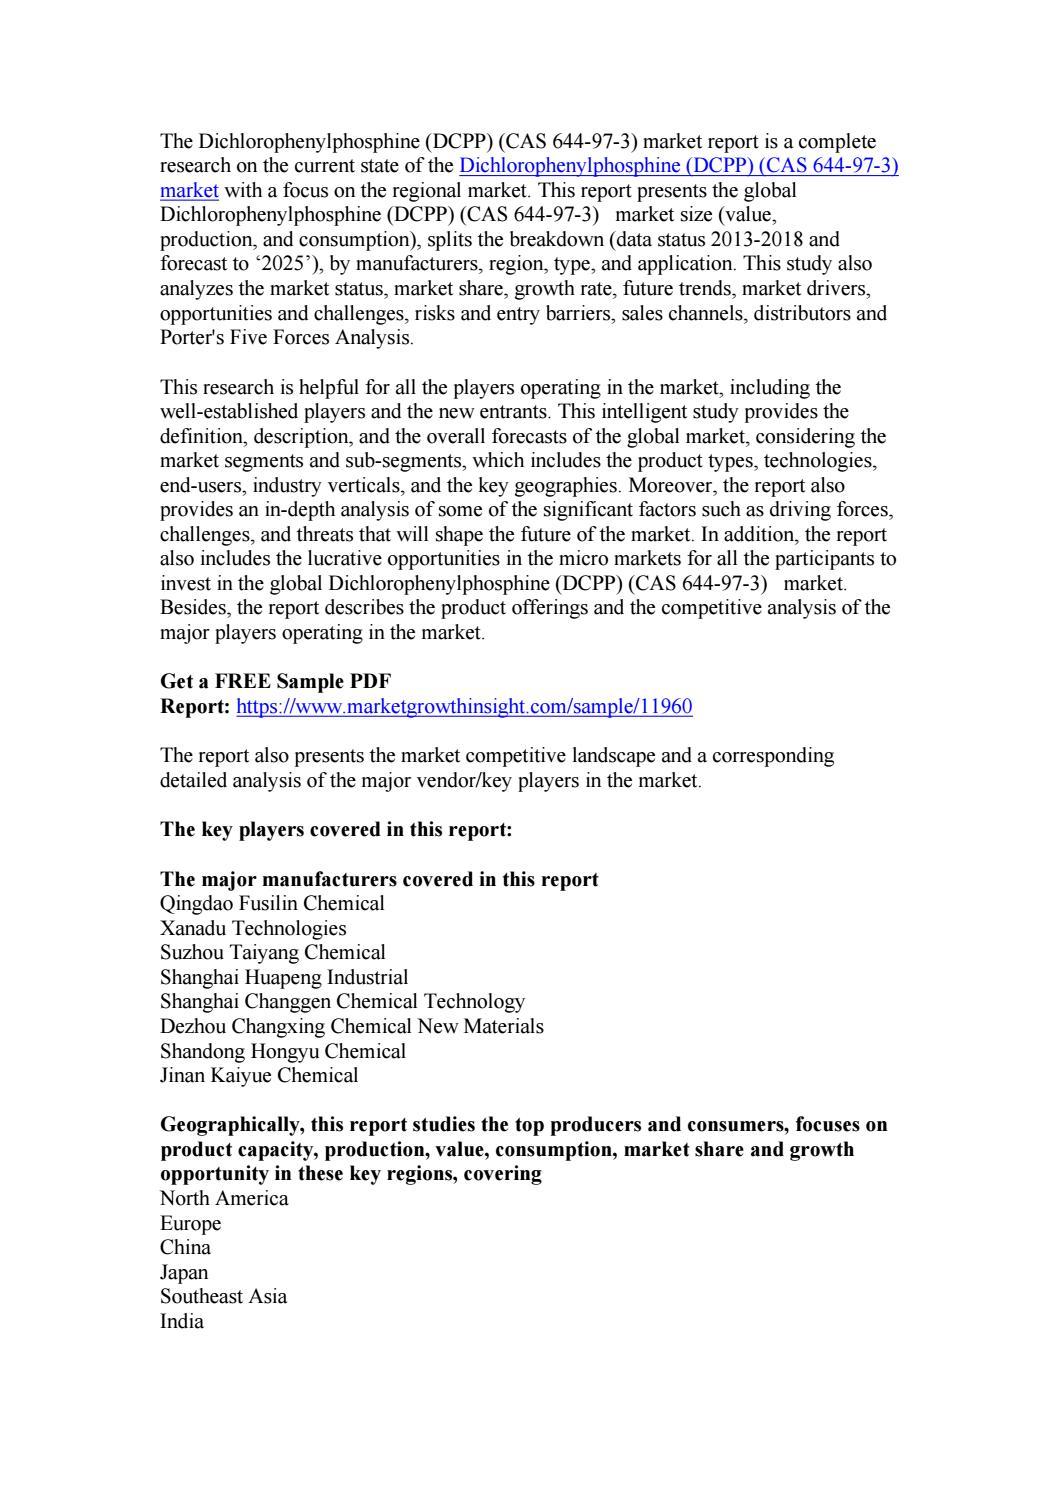 Dichlorophenylphosphine (DCPP) (CAS 644-97-3) Market Analysis and